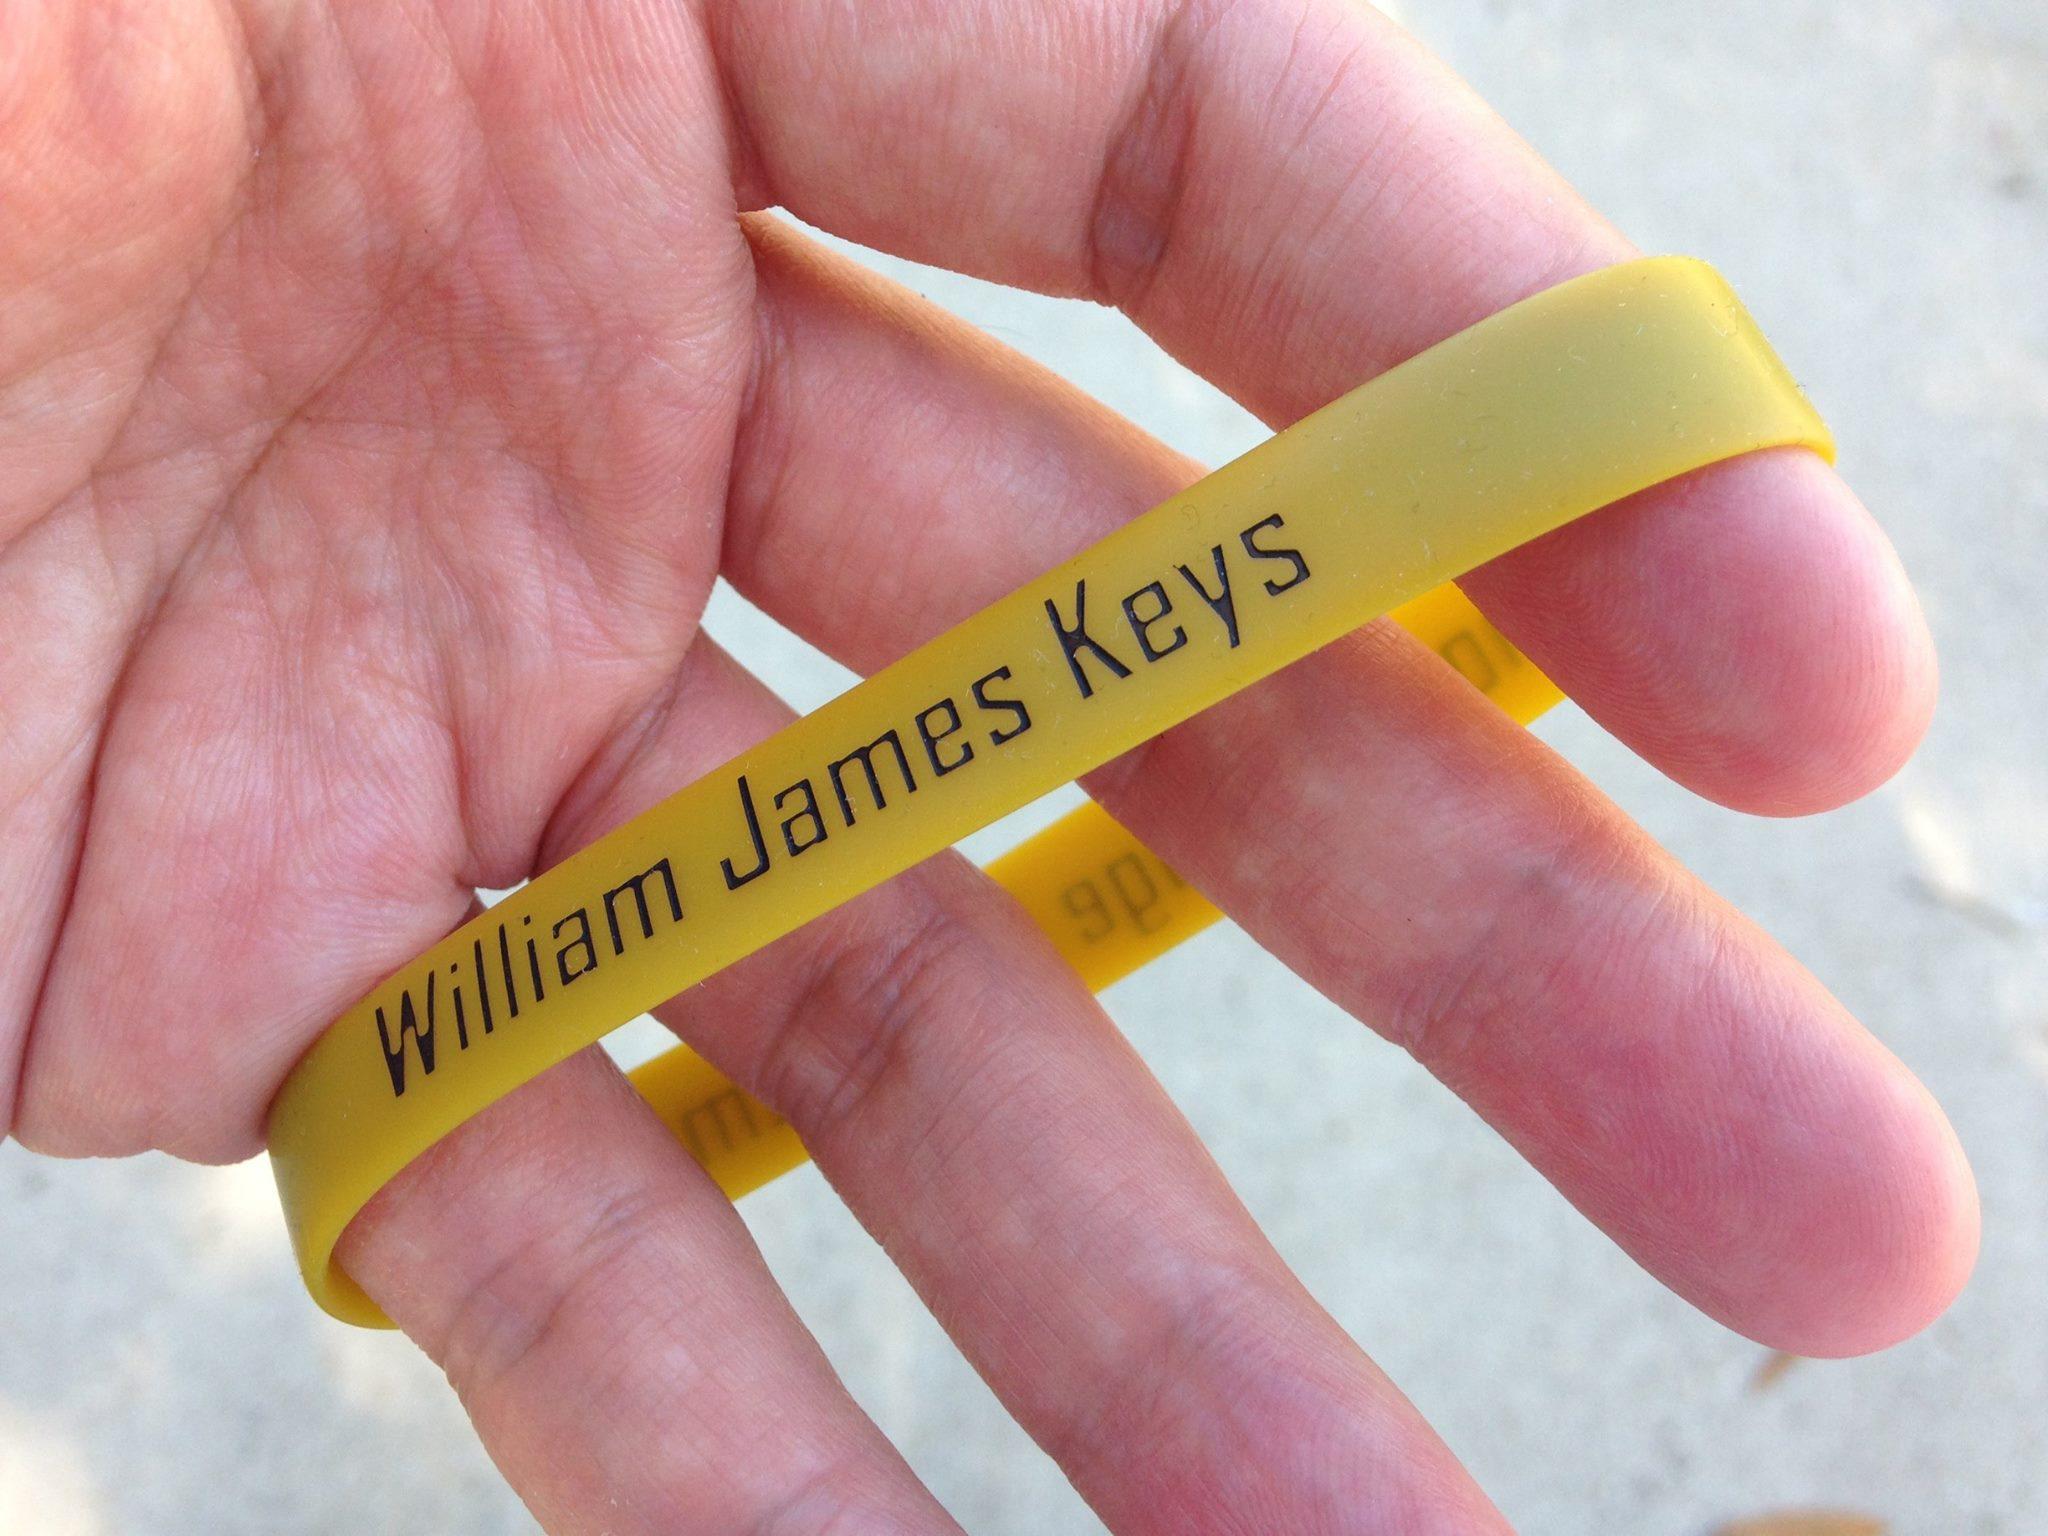 William James Keys memory bracelet